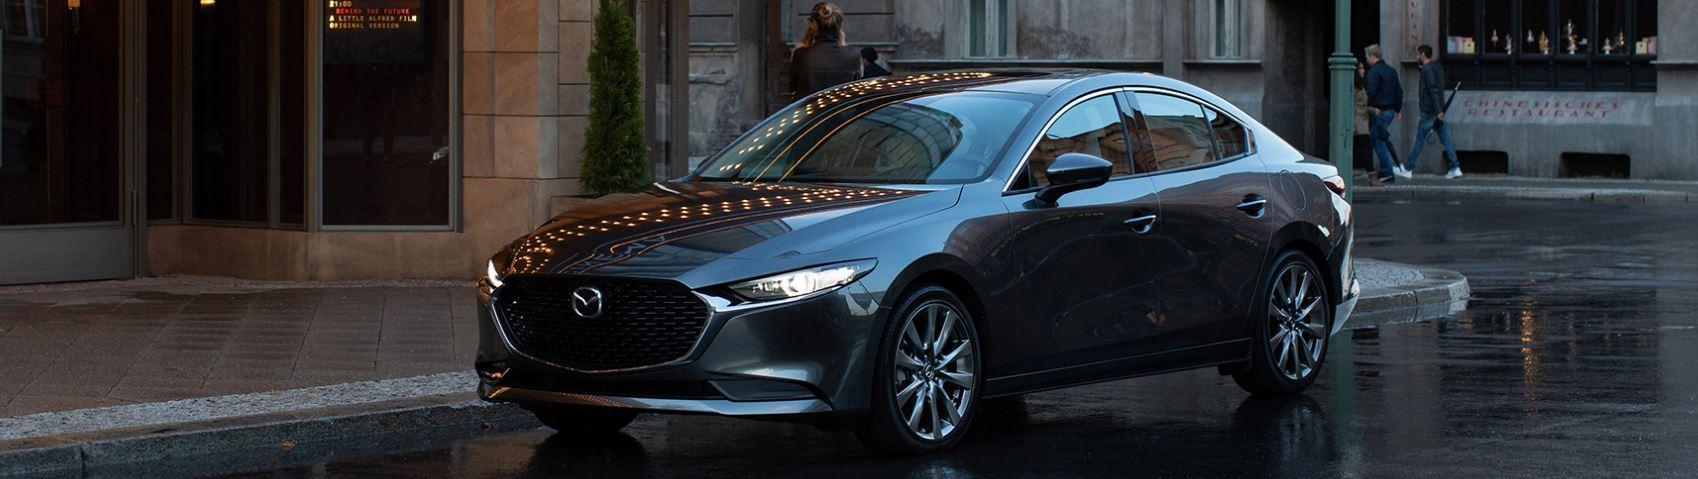 2019 Mazda 3 Trims